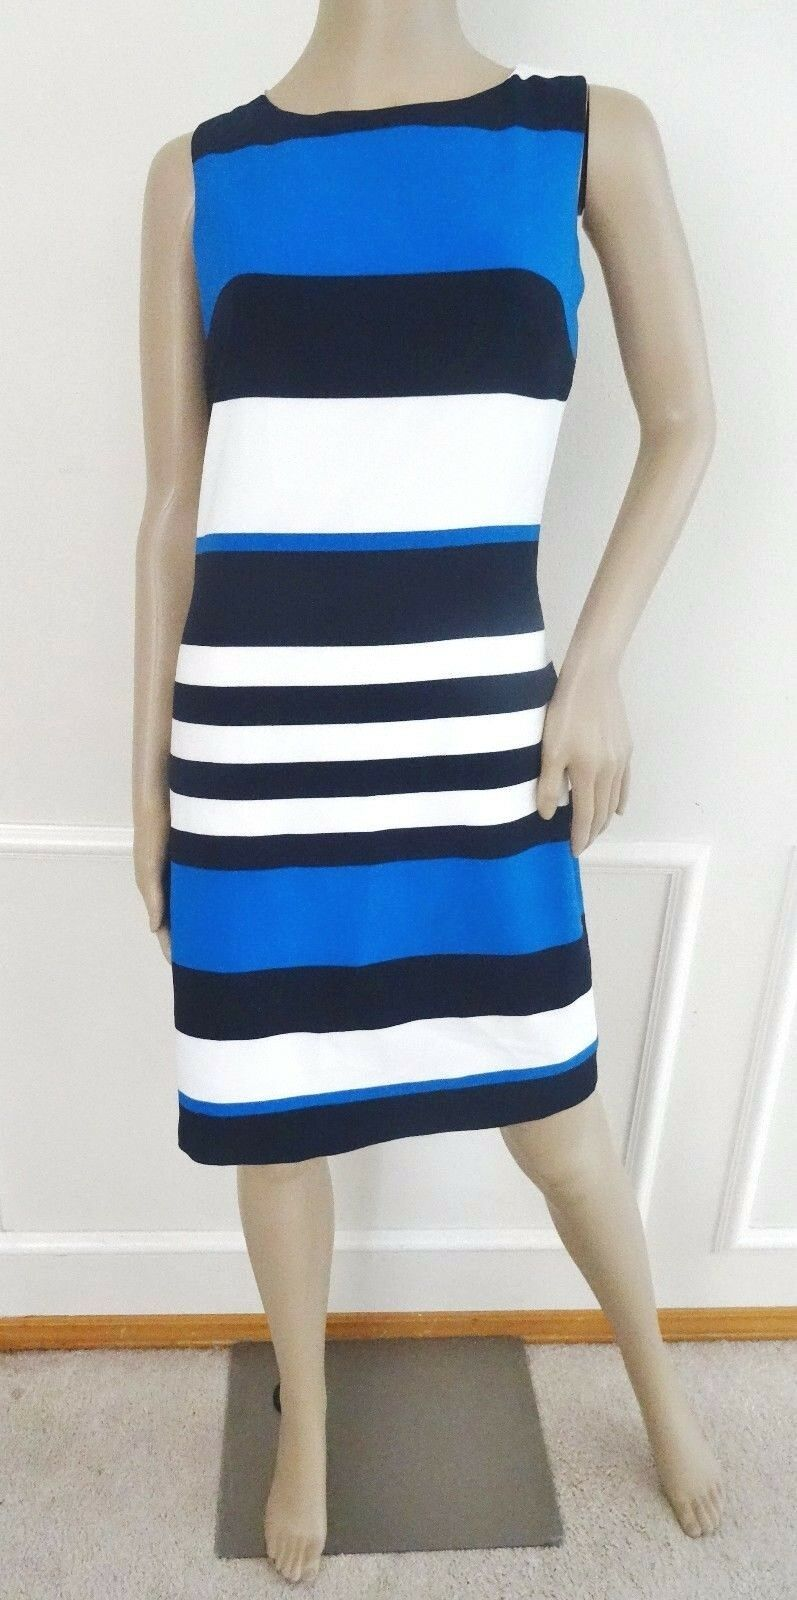 Nwt Lauren Ralph Lauren Stretch Sheath Work Day Dress Sz 8 Blau Ivory Block